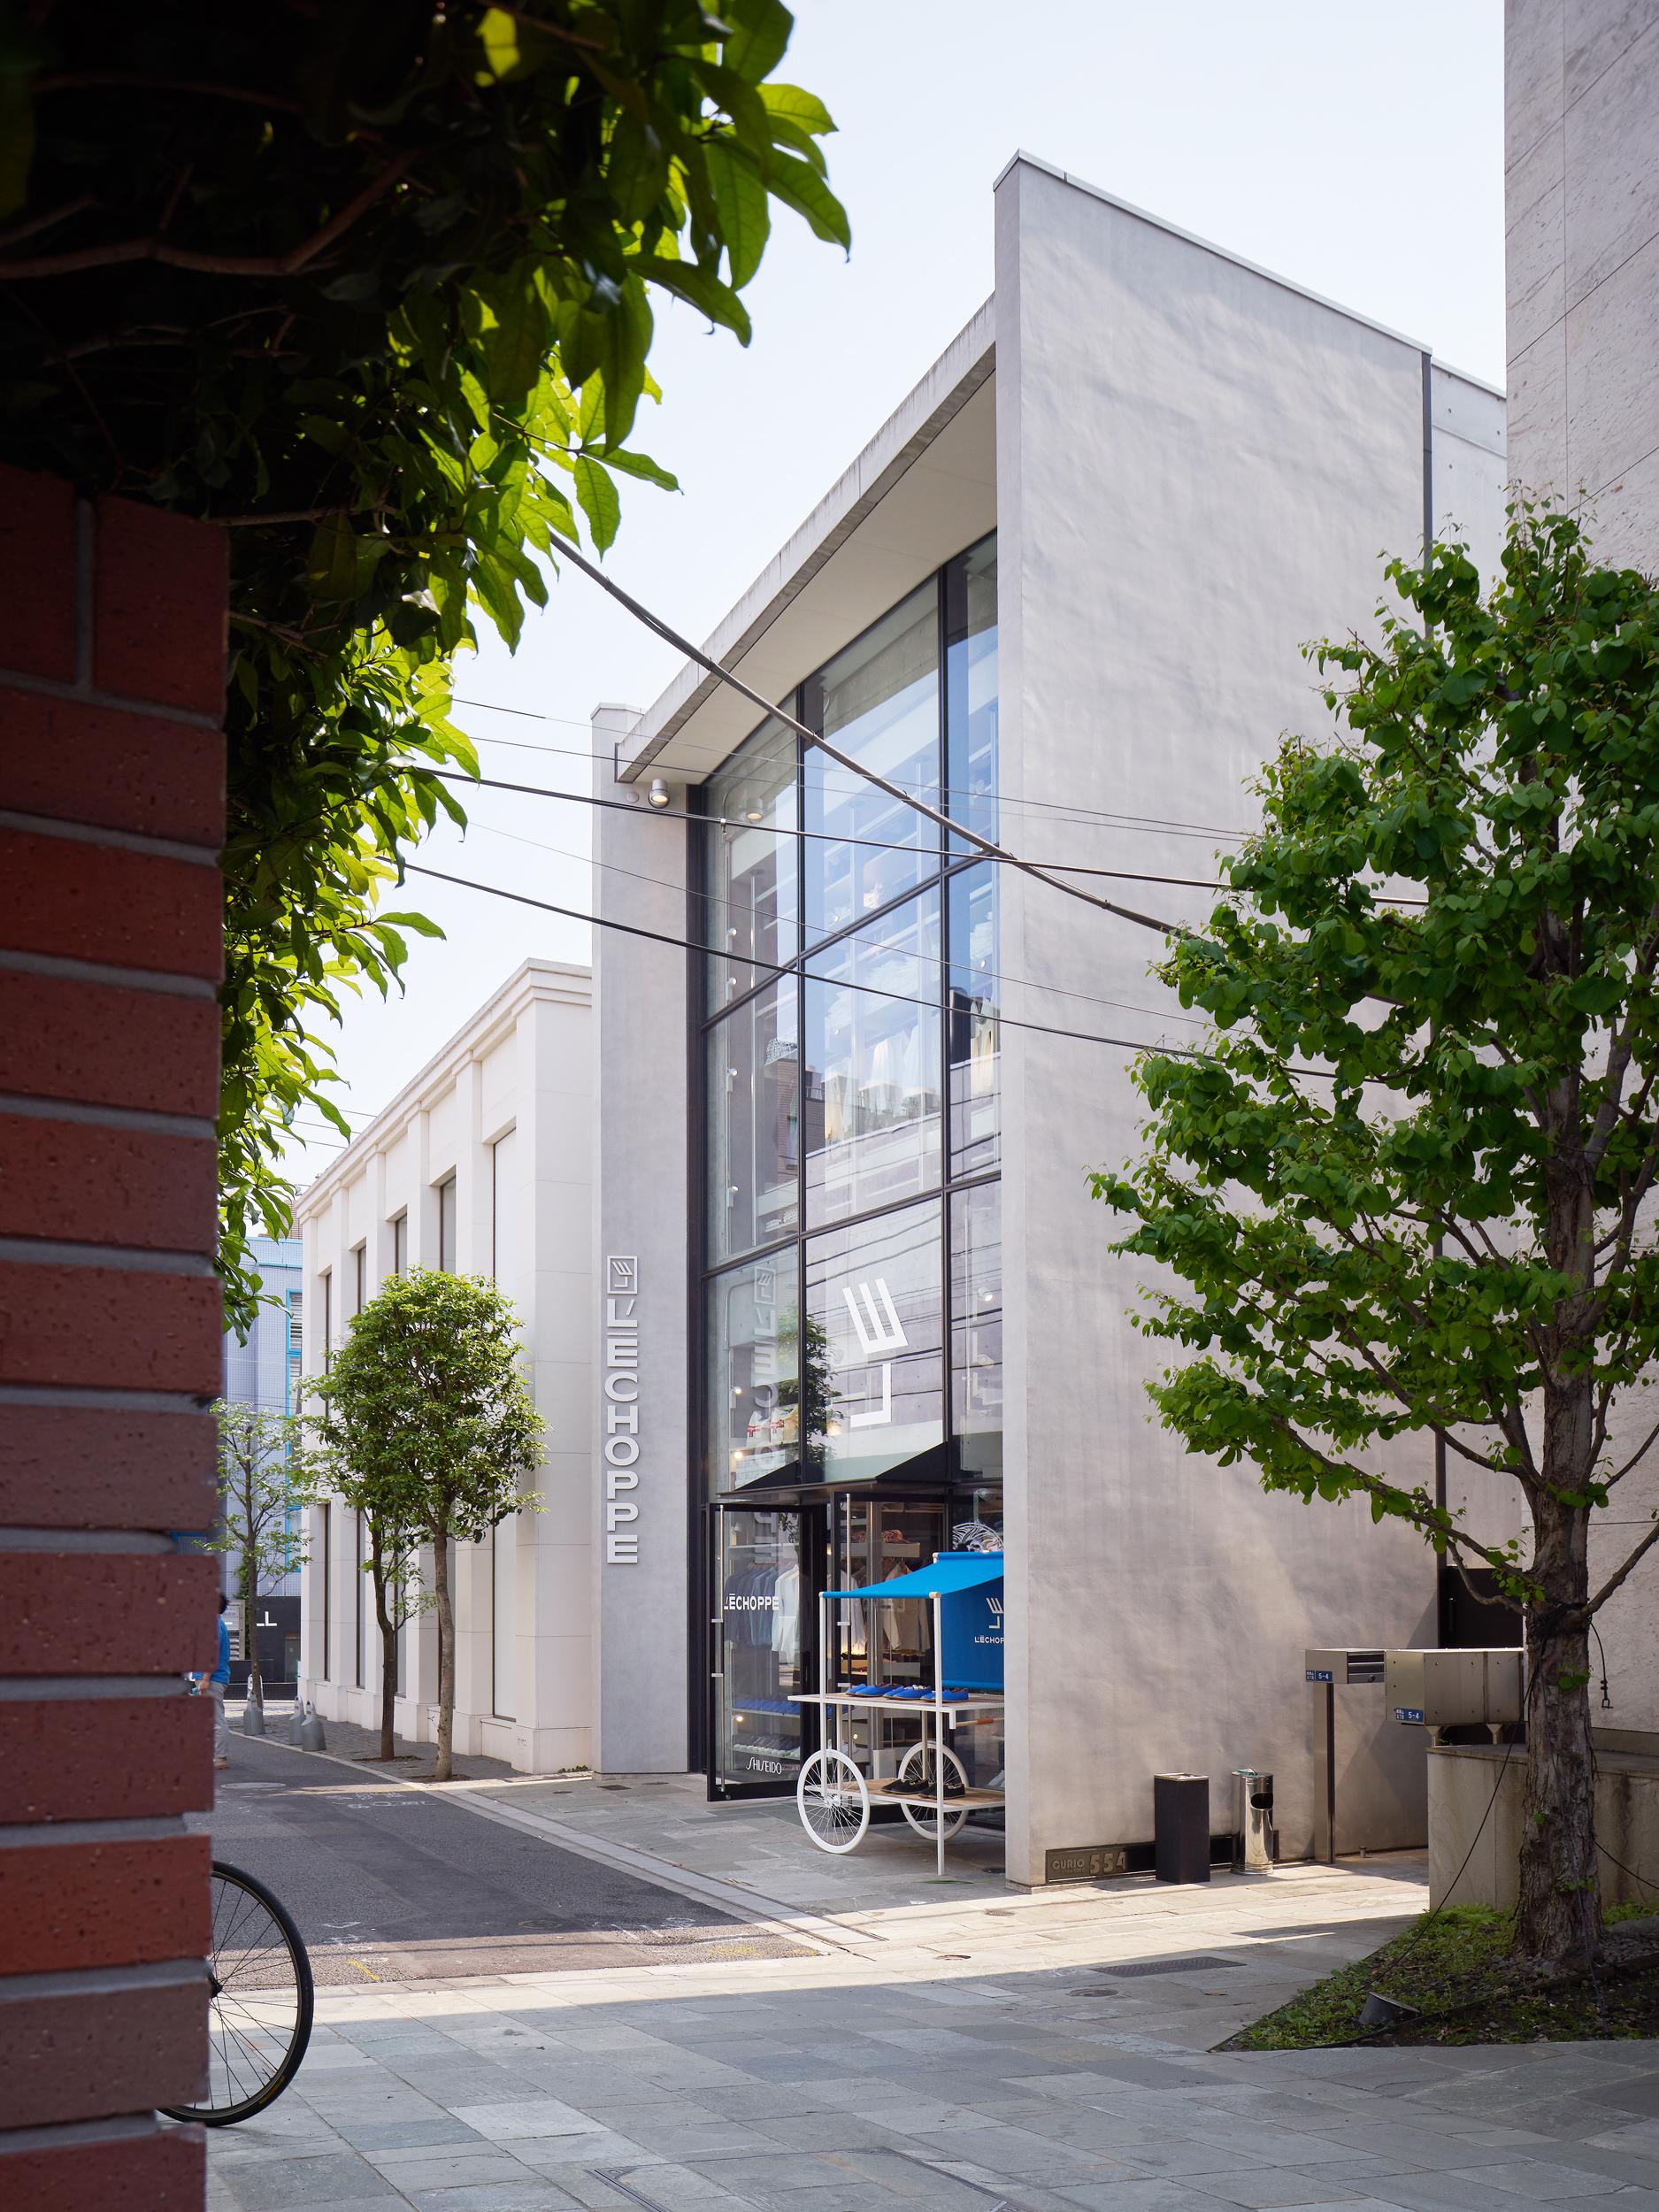 01_Cut Architectures_ l Echoppe Tokyo01 Copyright David foessel.jpg